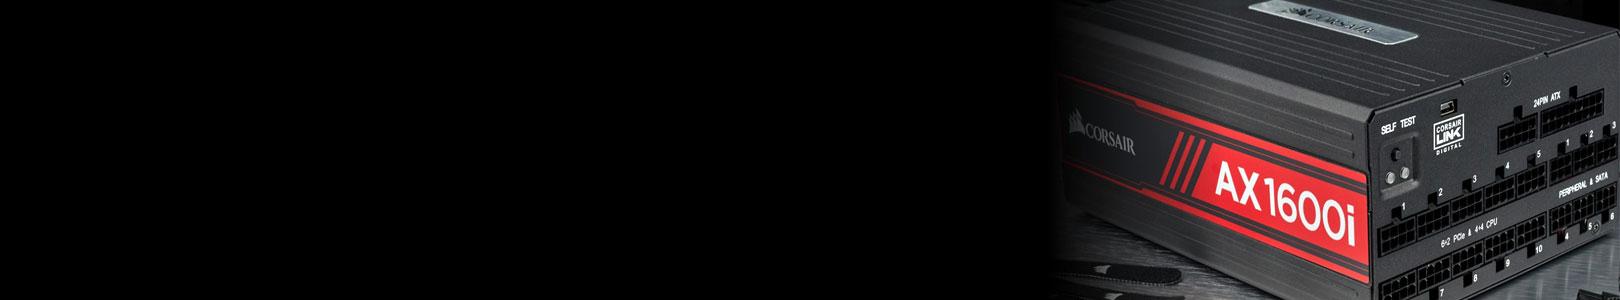 Netzteile